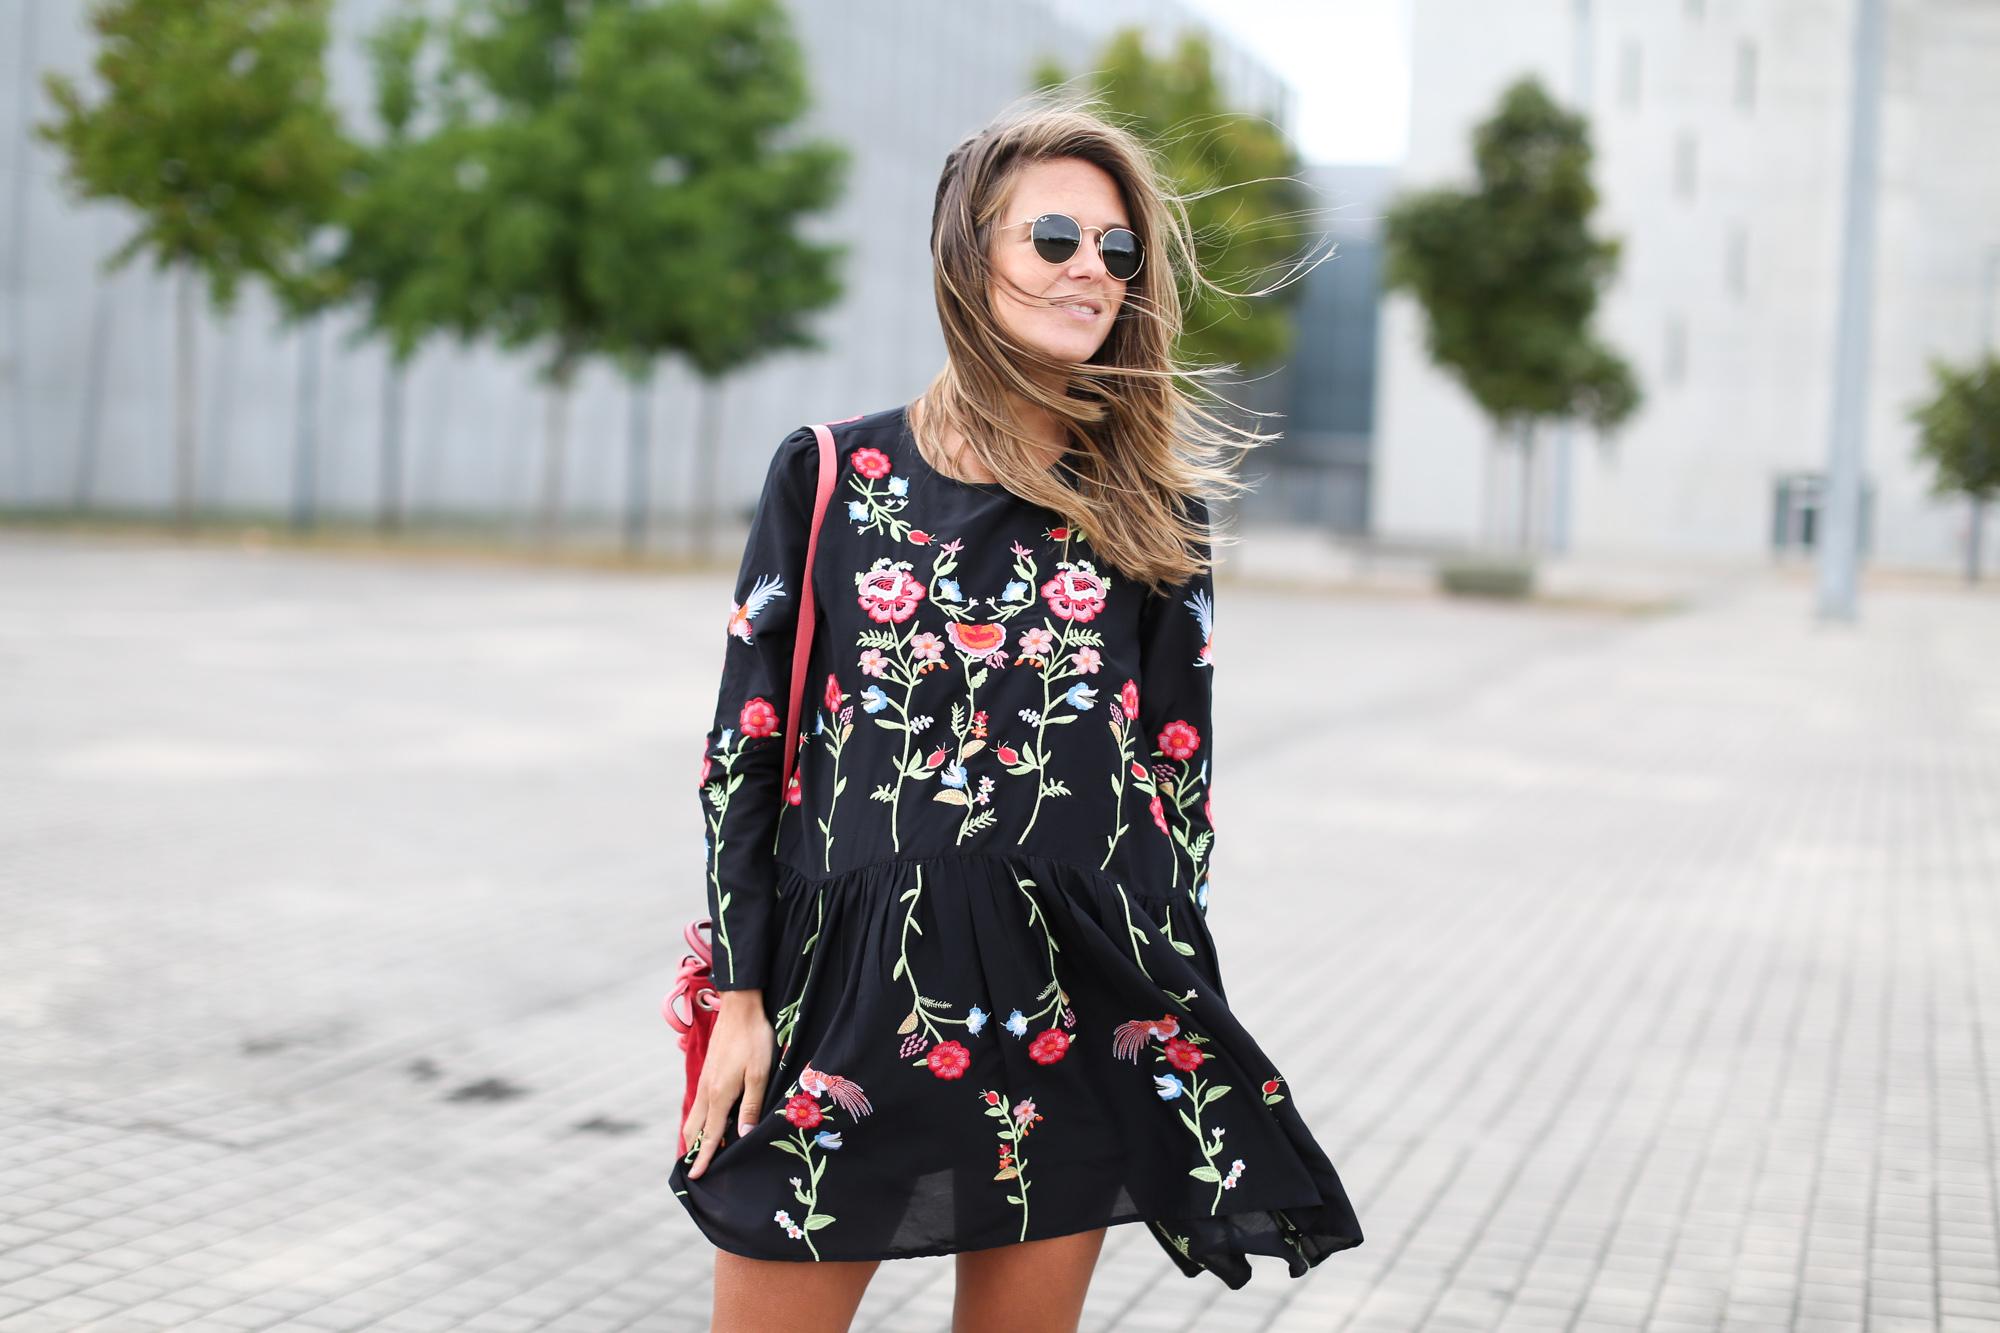 Clochet_streetstyle_fashionblogger_zaraembroidedminidress_titamadrid_miniparadis-4